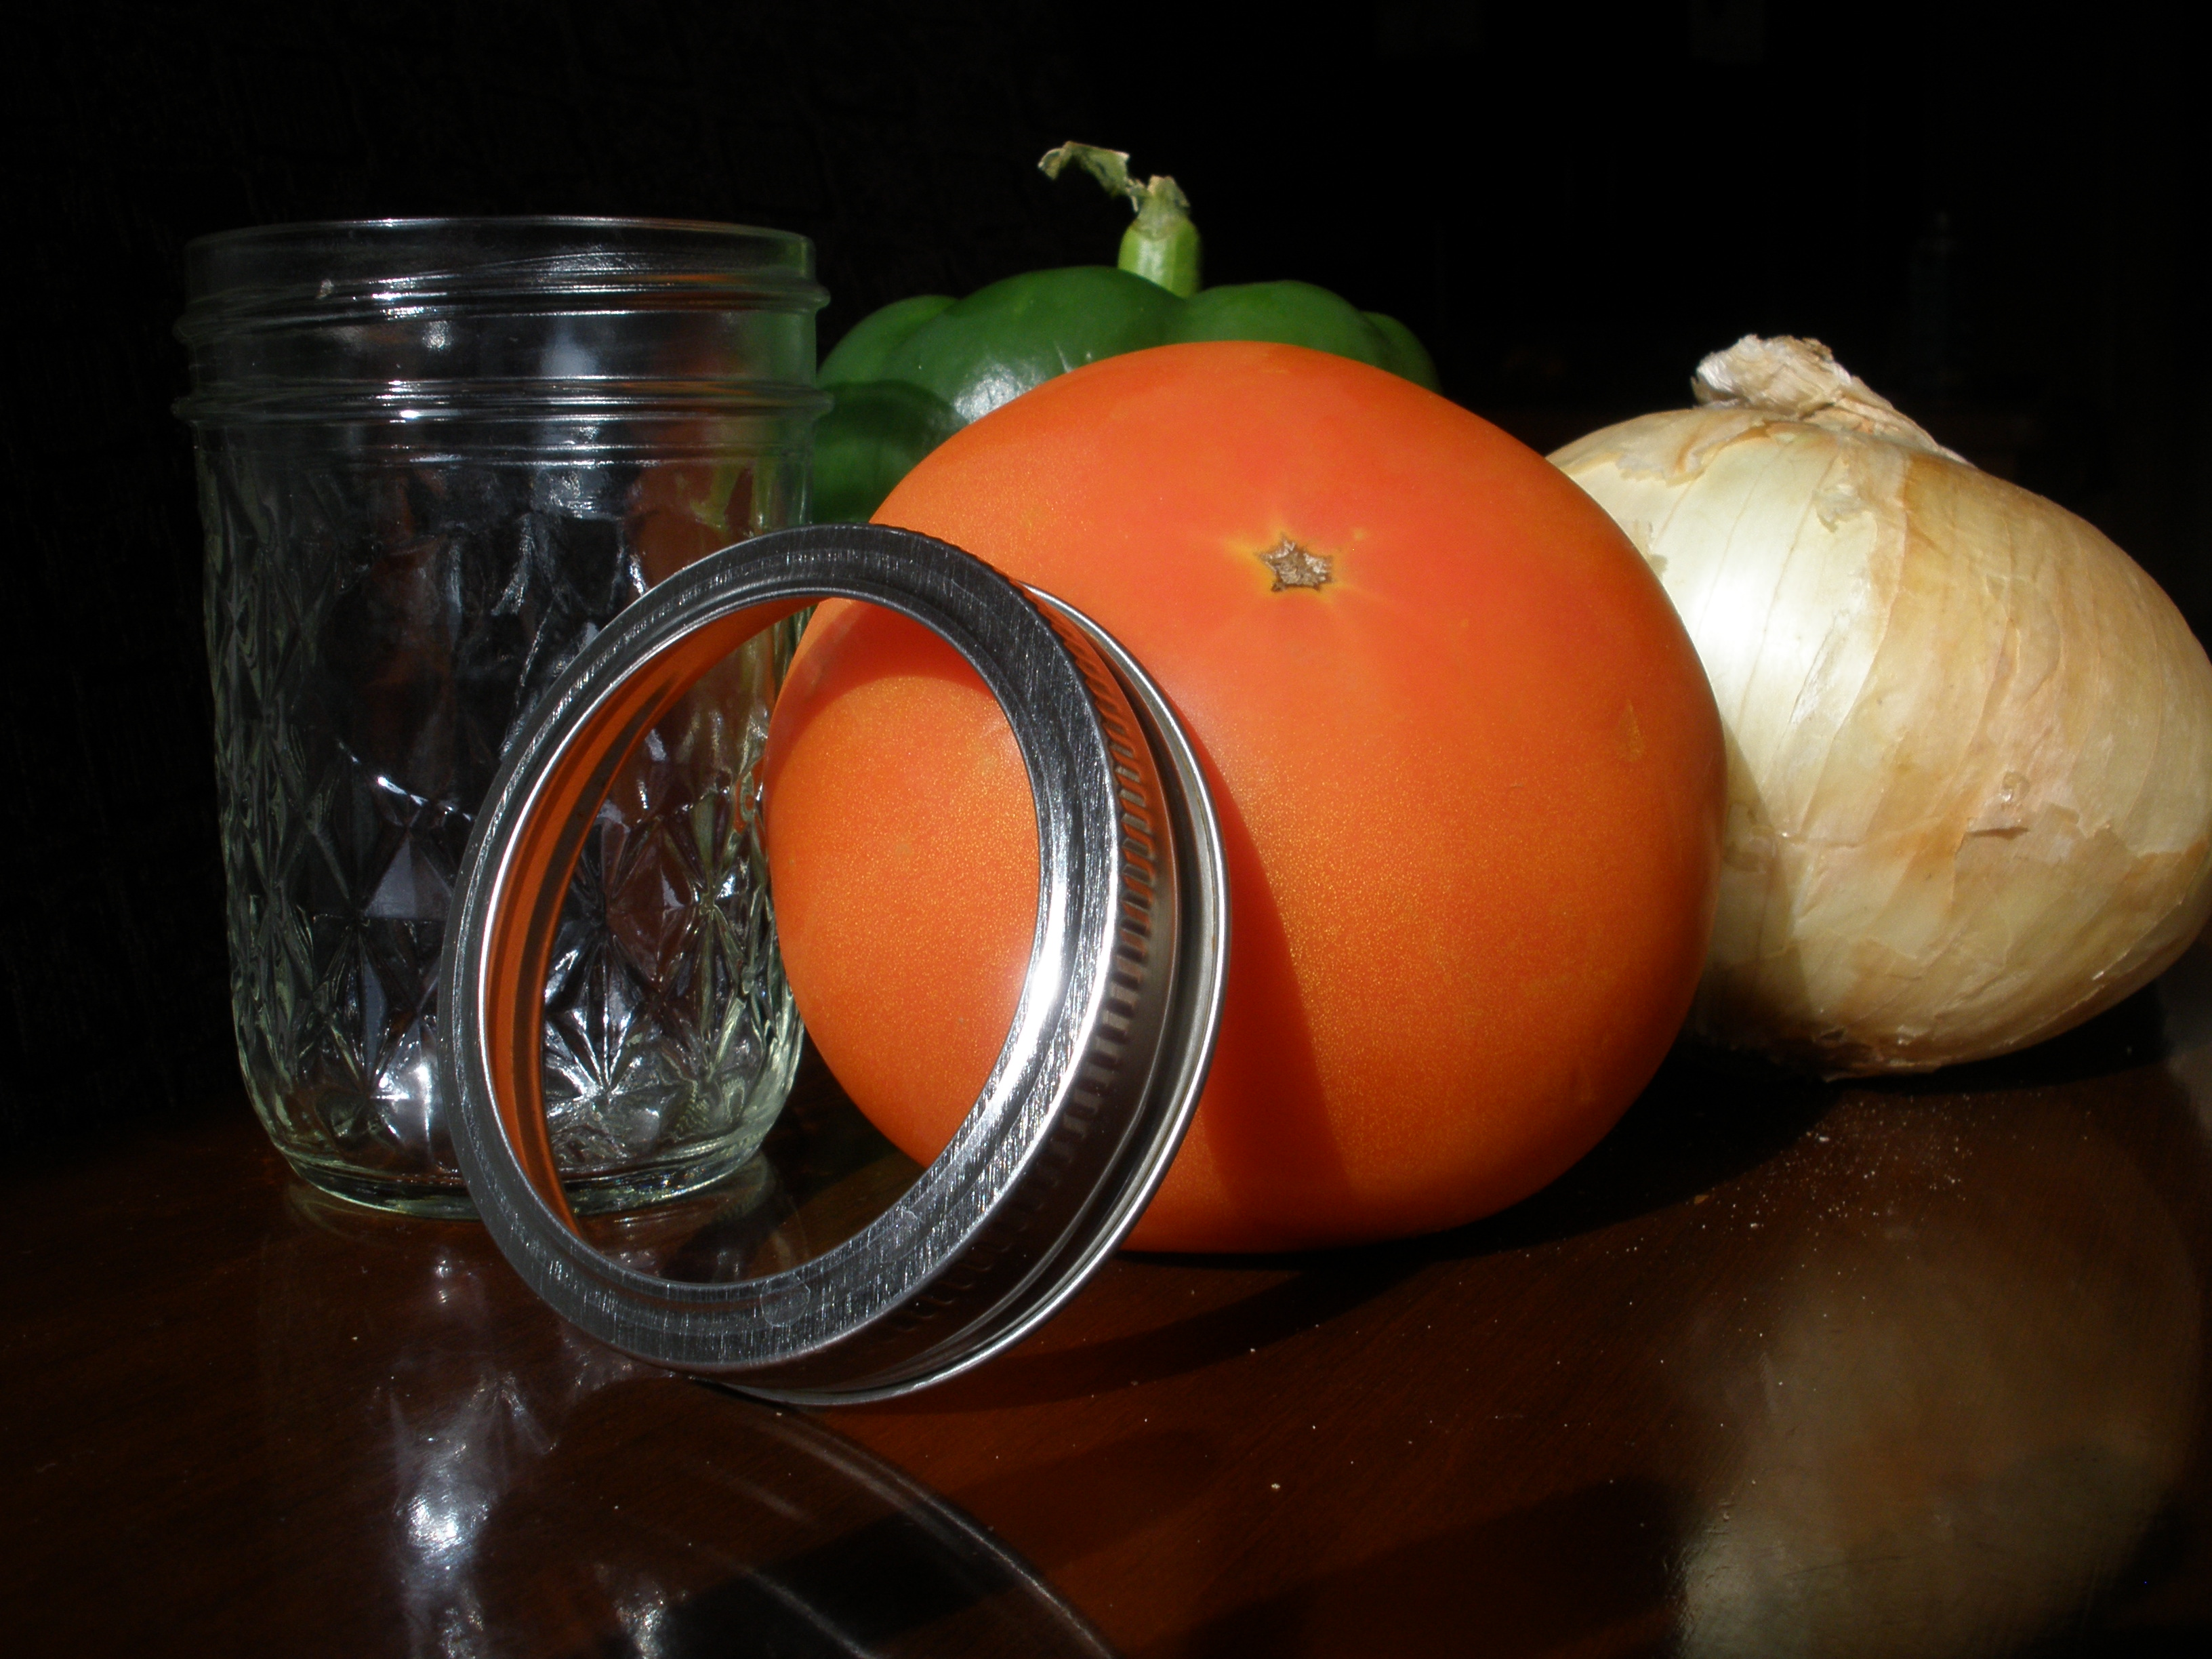 Canning jar, tomato, onion, green pepper